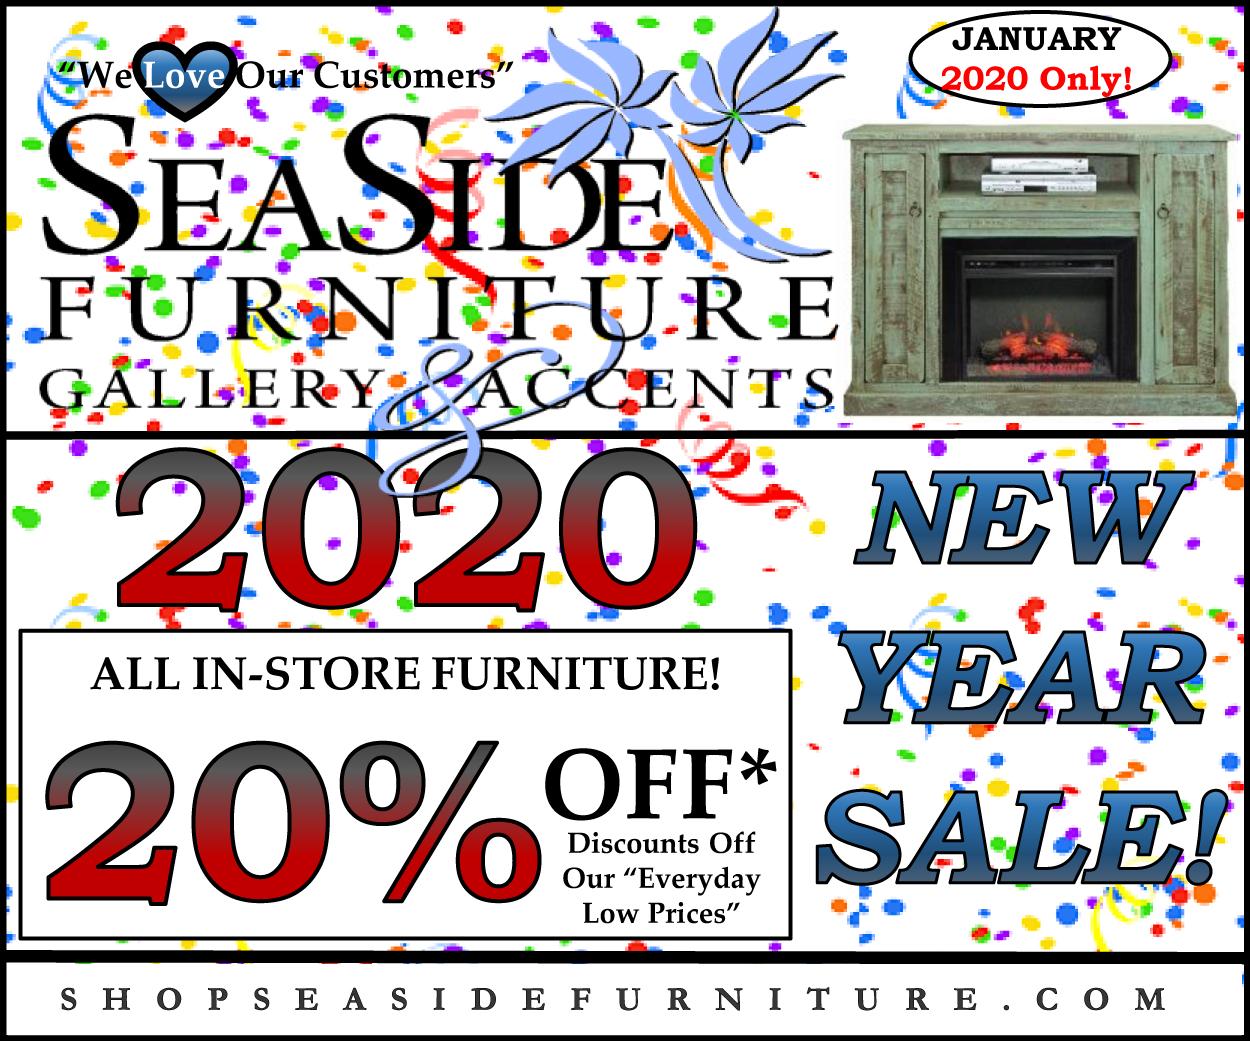 Seaside Furniture